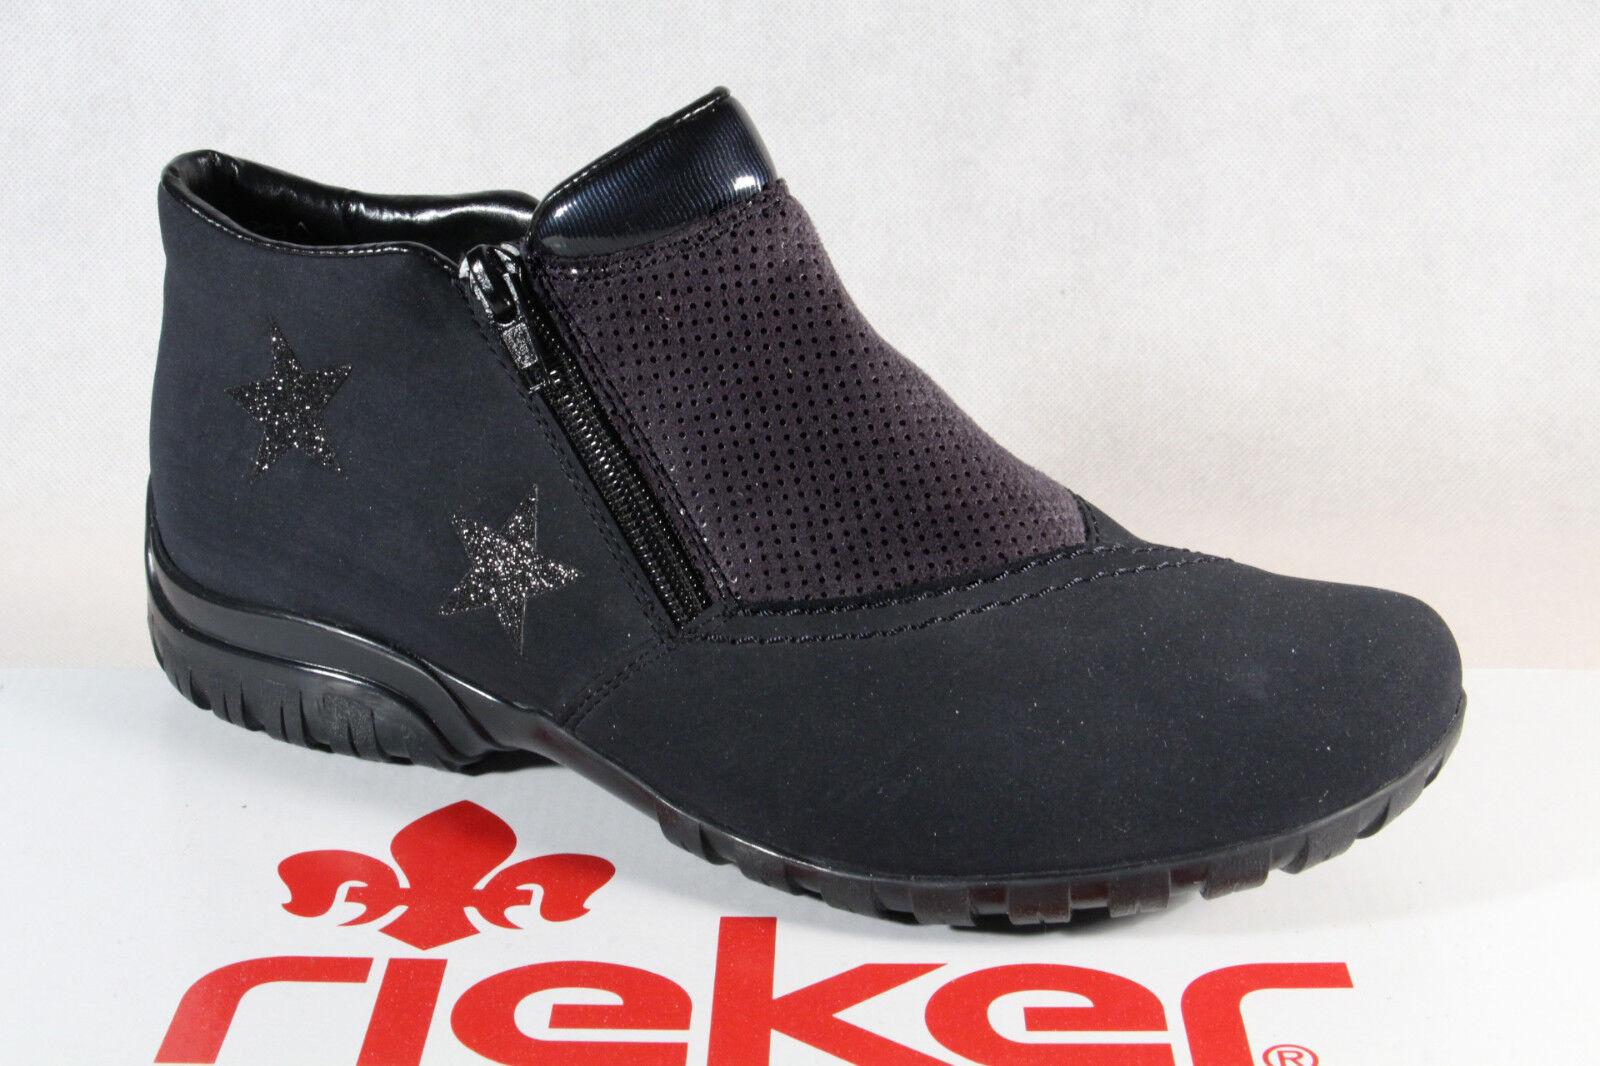 Rieker Pantofola Stivaletti Scarpe Basse Stivali Scarpe Importanti L4674 Nuovo